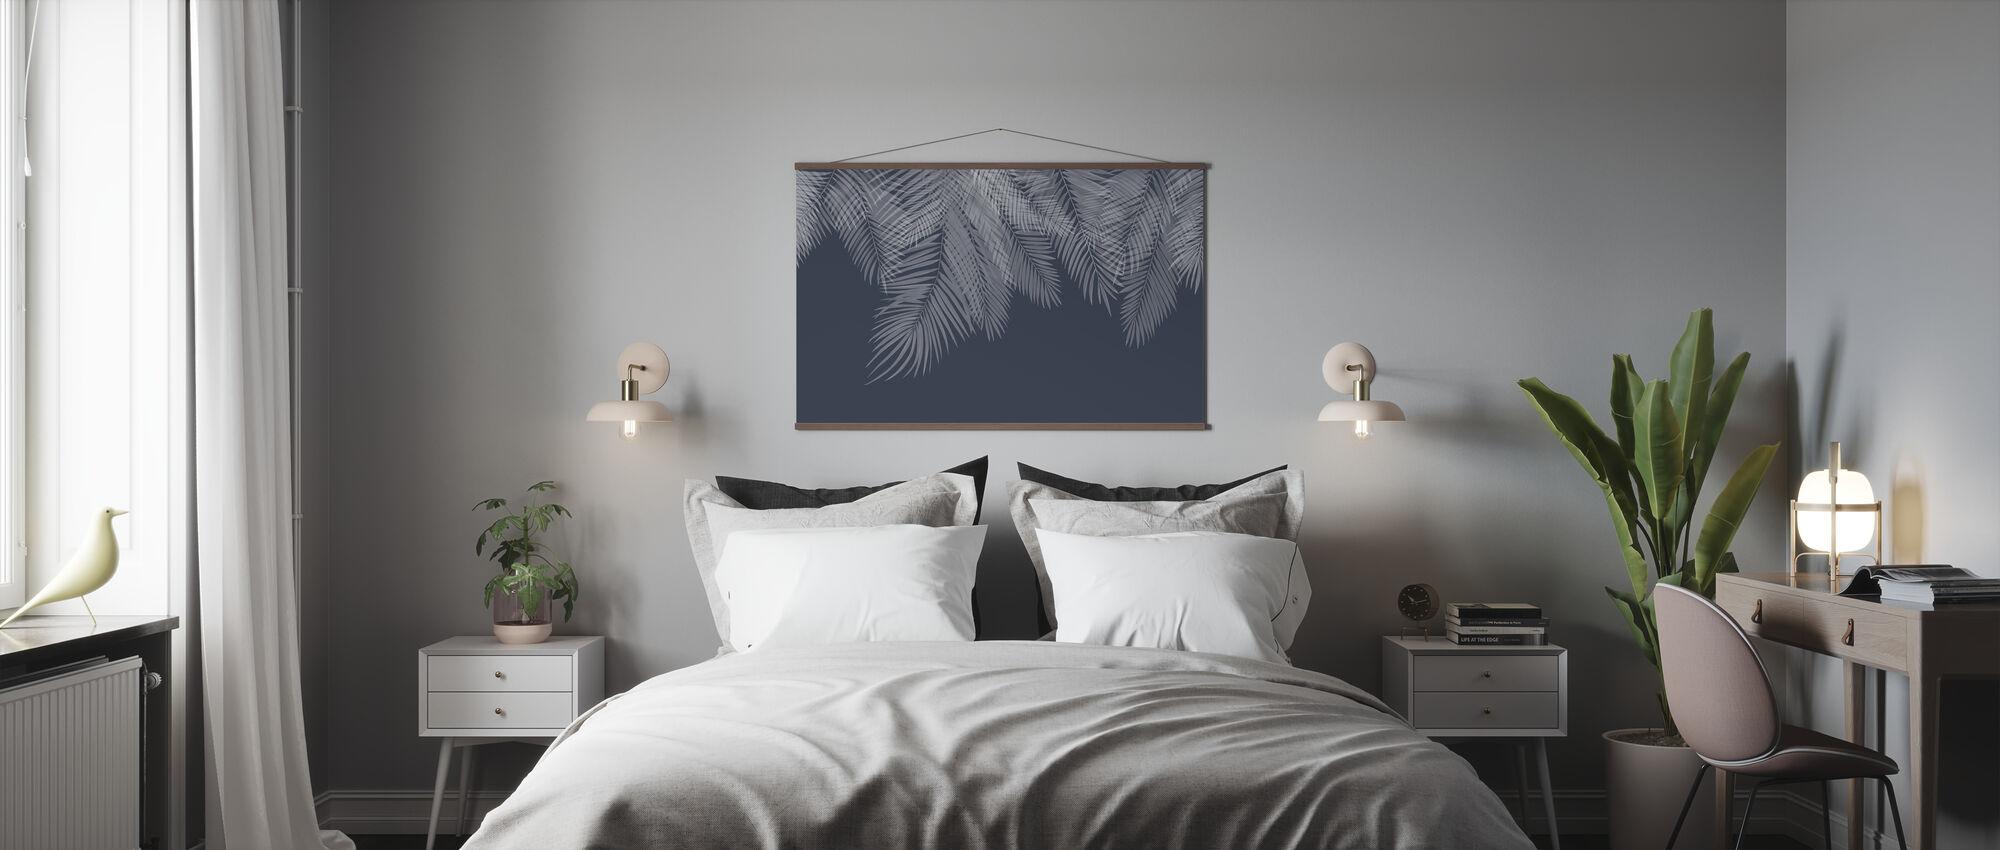 Hanging Palm Leaves - Blue - Poster - Bedroom